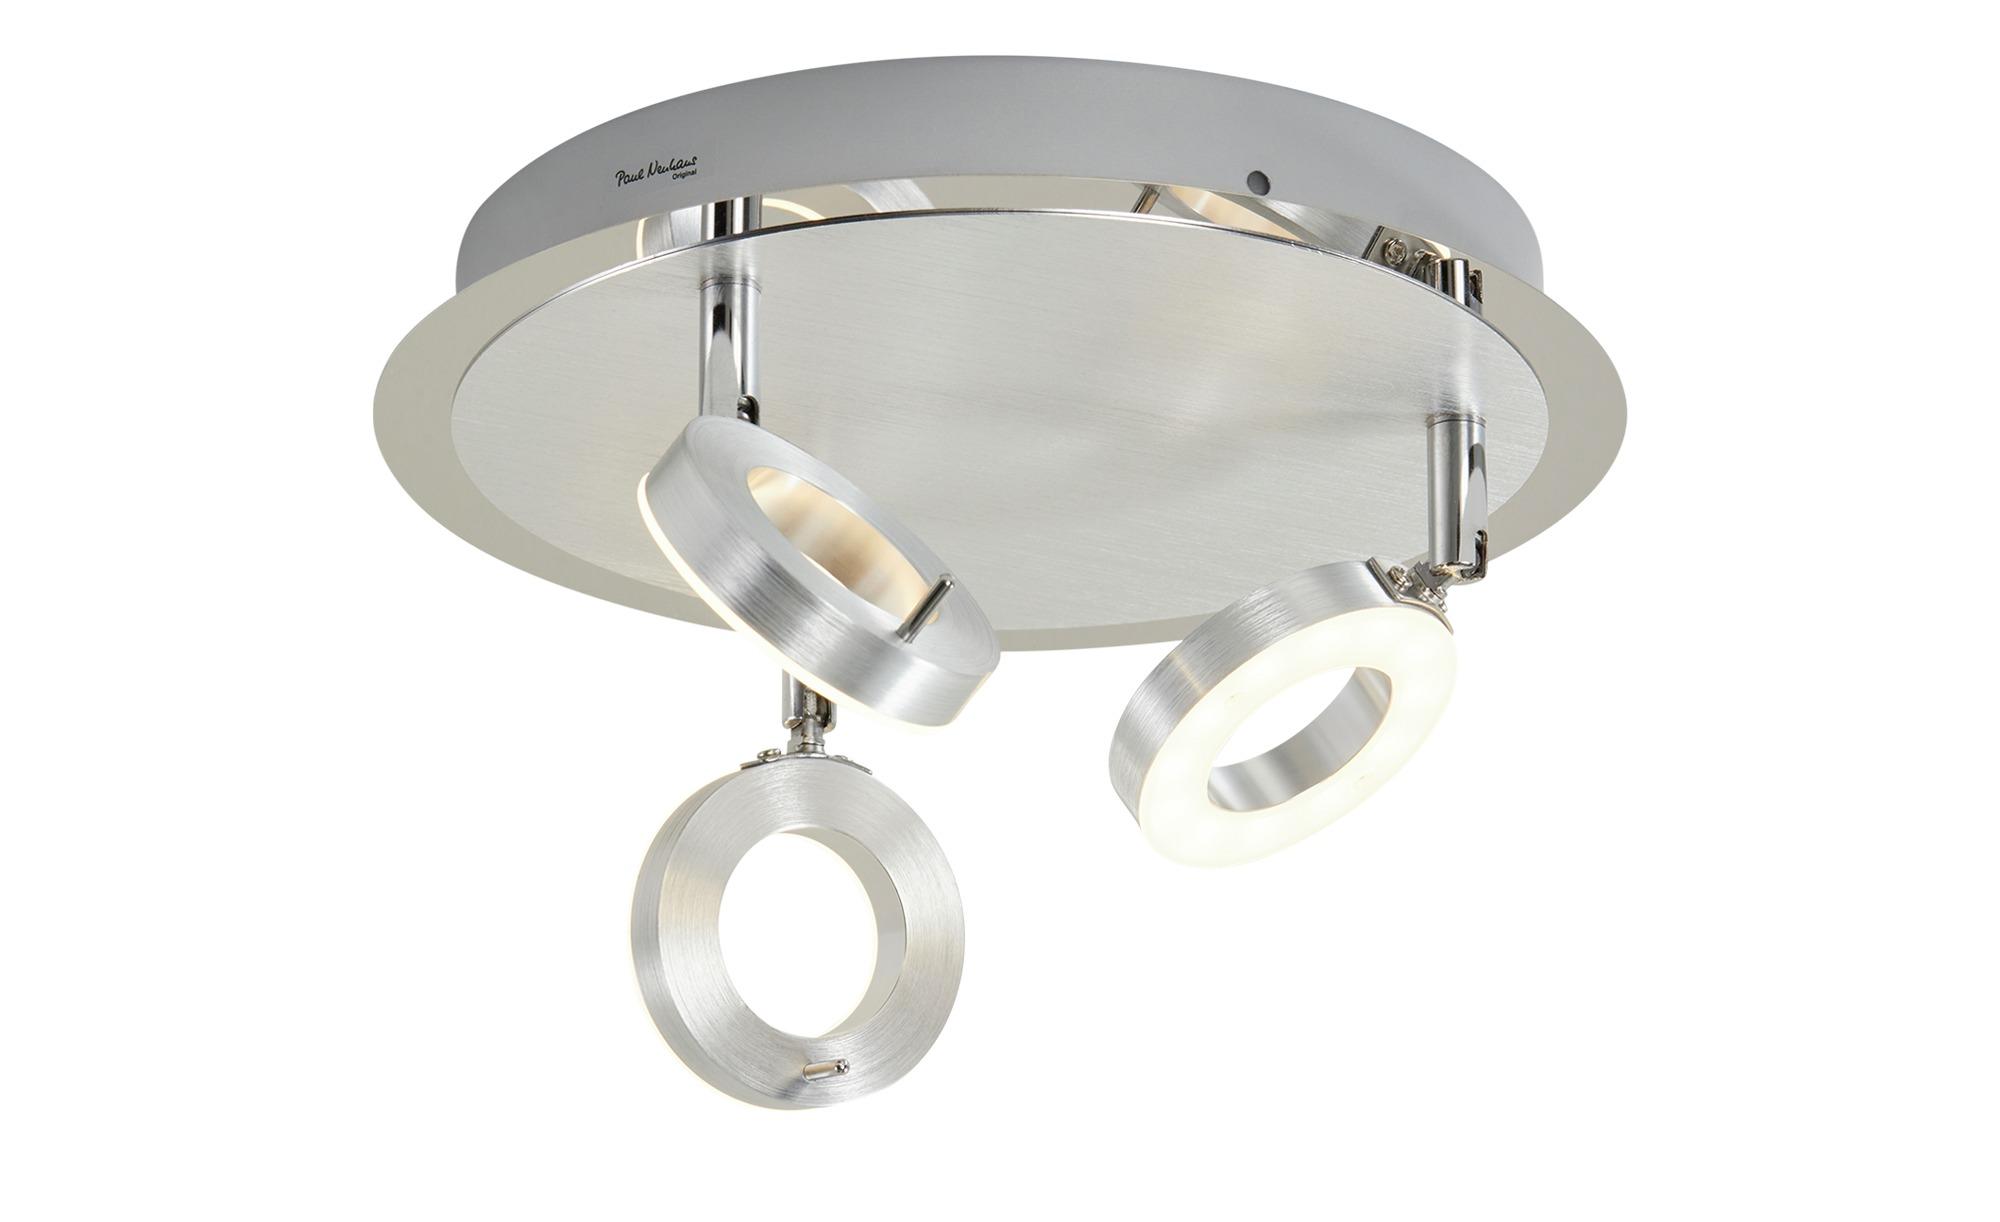 Paul Neuhaus LED Bad Deckenstrahler, 20 flammig, Aluminium, gefunden bei  Möbel Höffner